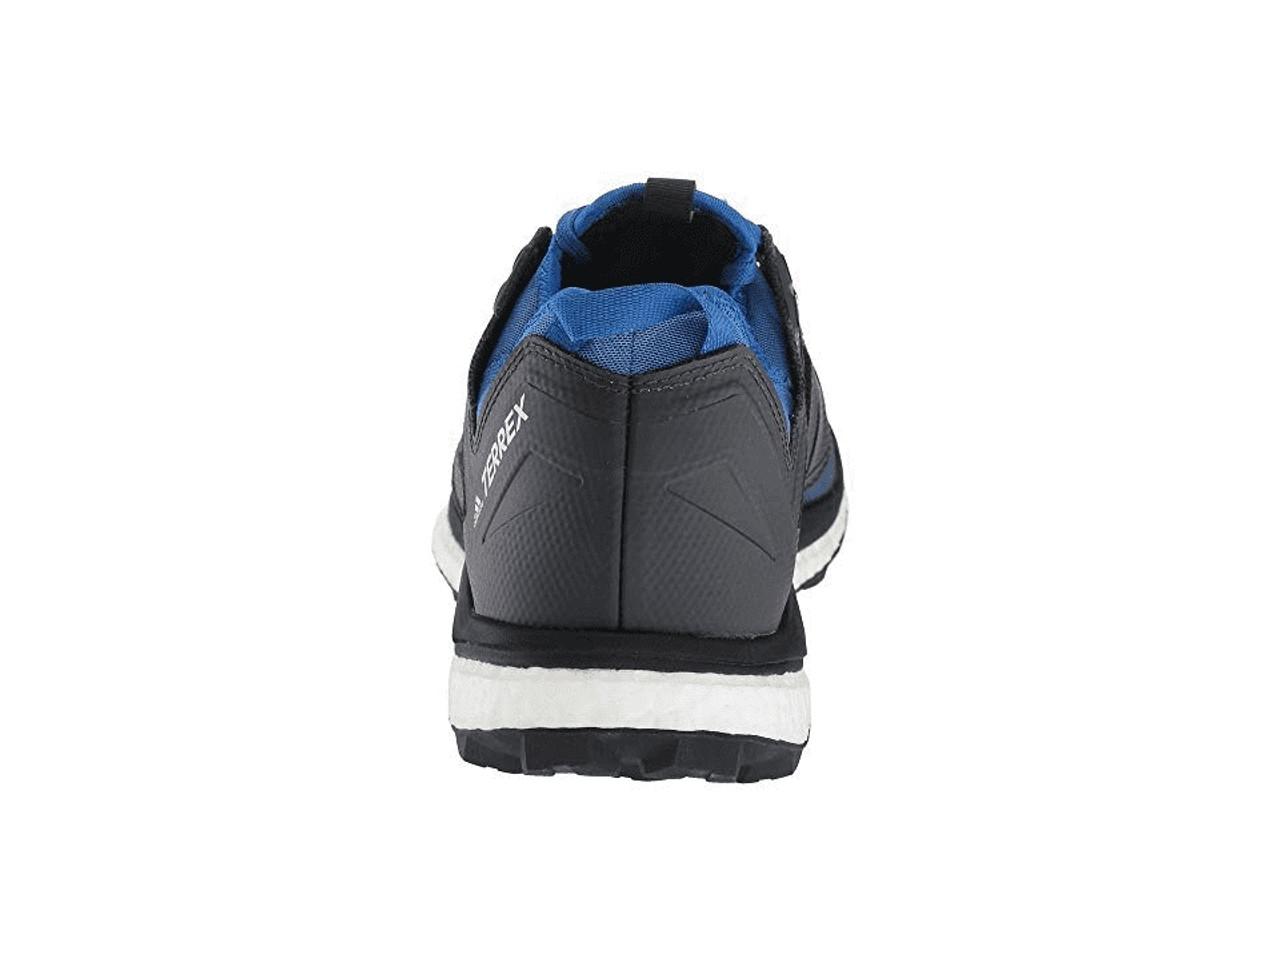 f1ec771db7b50 Adidas Terrex Agravic Xt Gtx Mens Black Grey Blue